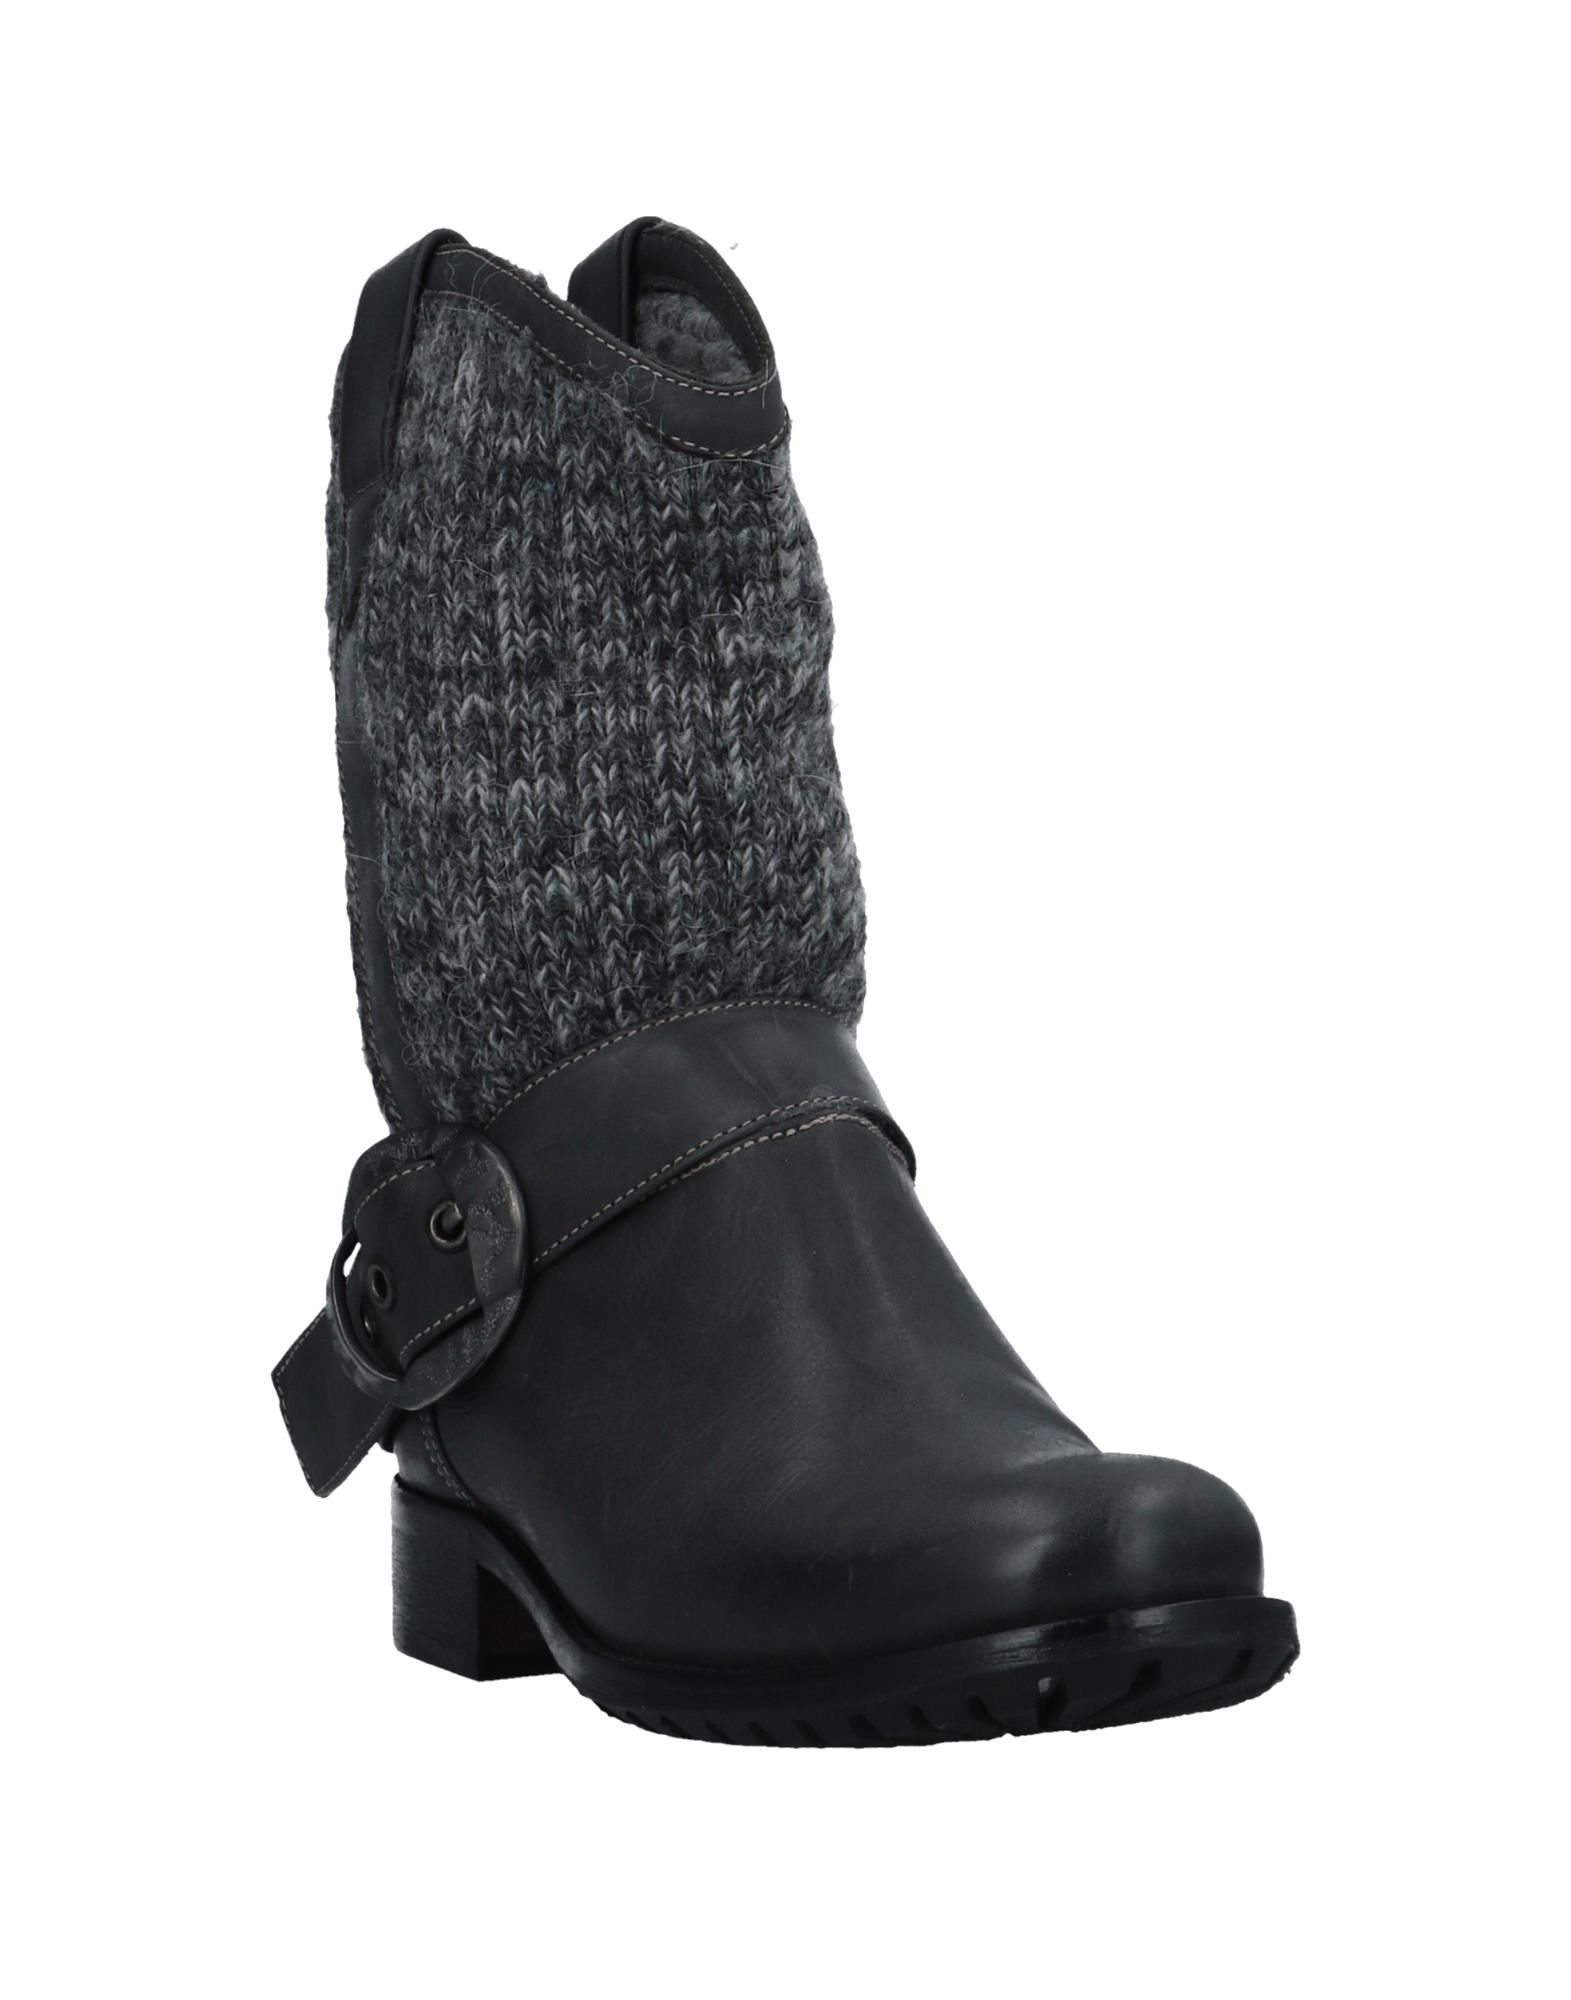 Stilvolle By billige Schuhe Materia Prima By Stilvolle Goffredo Fantini Stiefelette Damen  11537563EL 6f53df